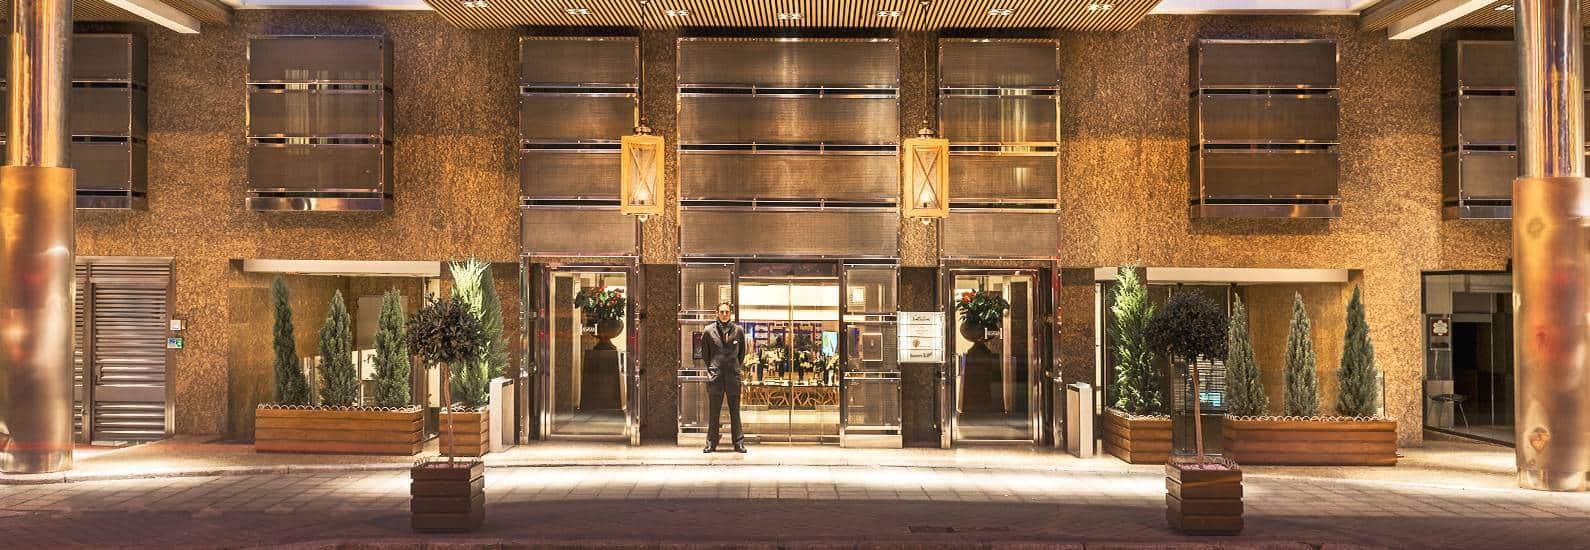 Hesperia Hotels & Resorts Madrid